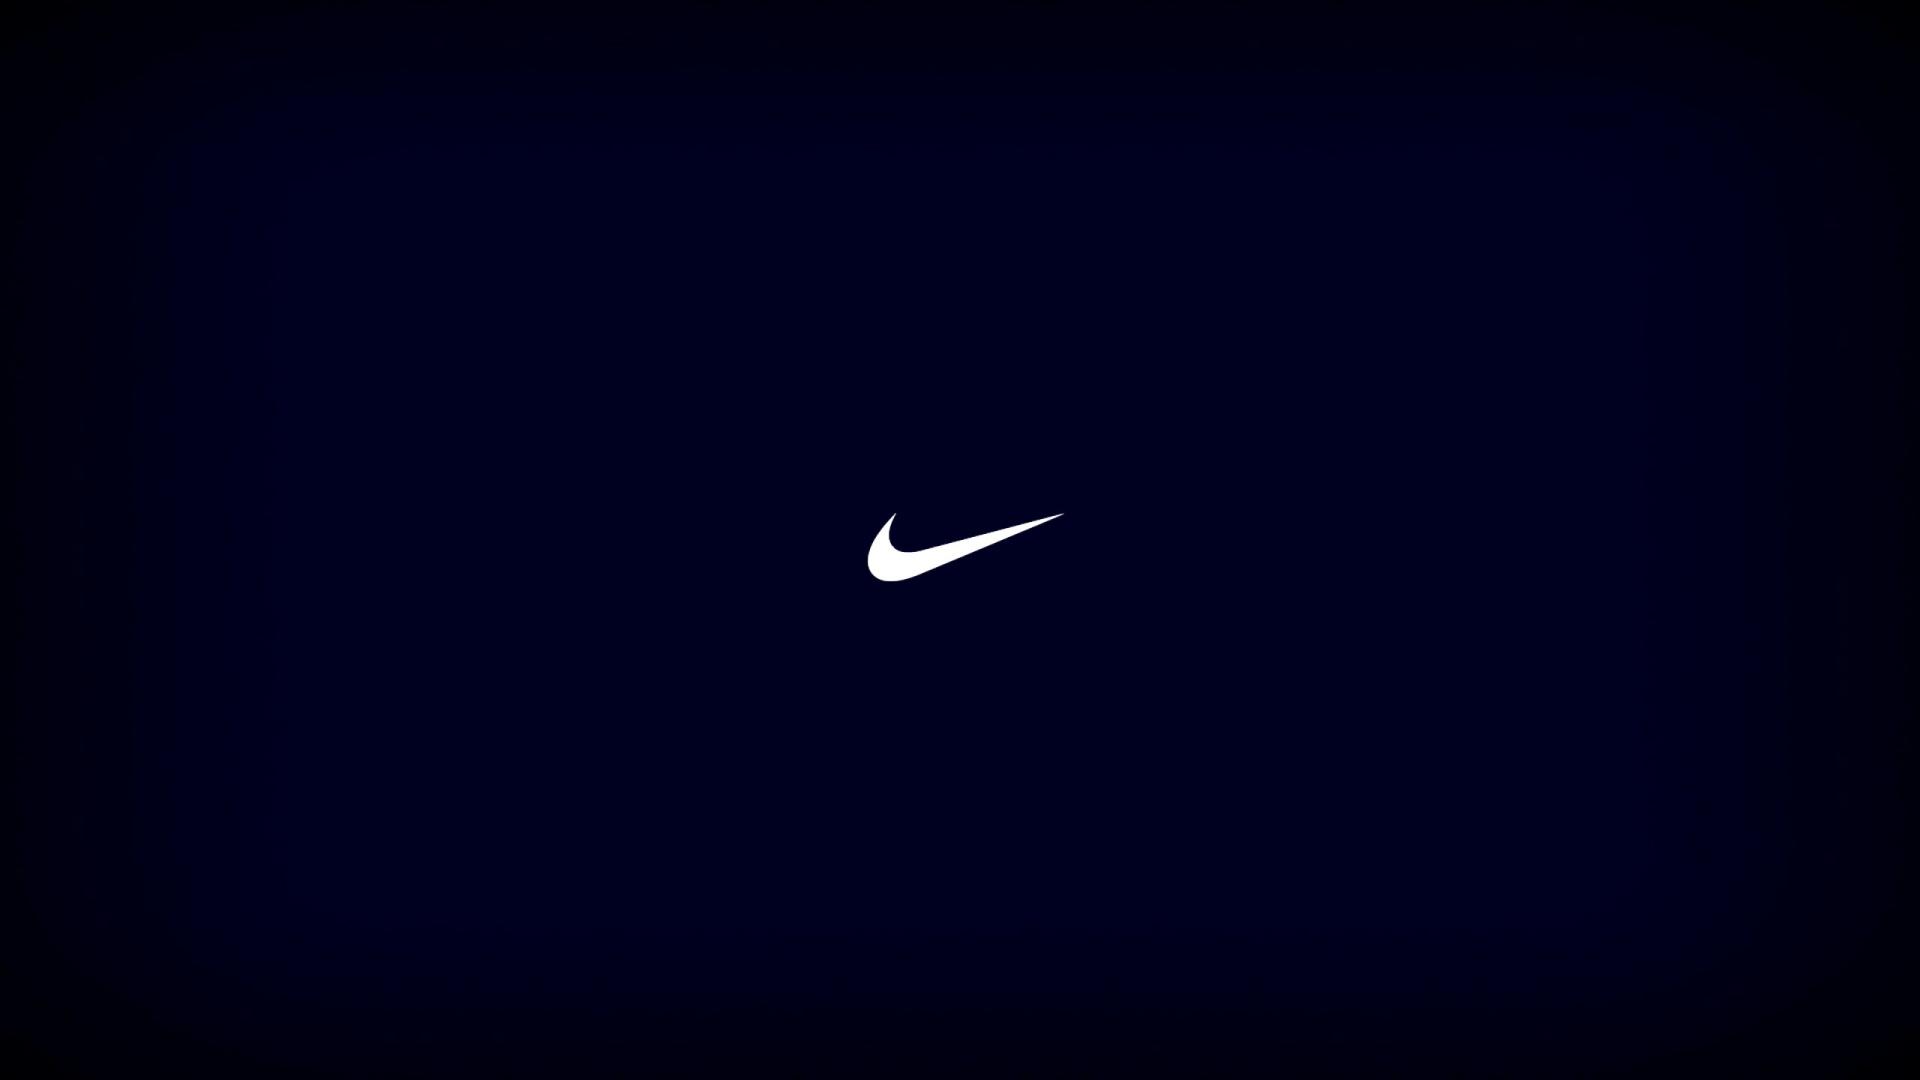 Nike Logo On The Blue Background Wallpaper Des 6930 Wallpaper High 1920x1080